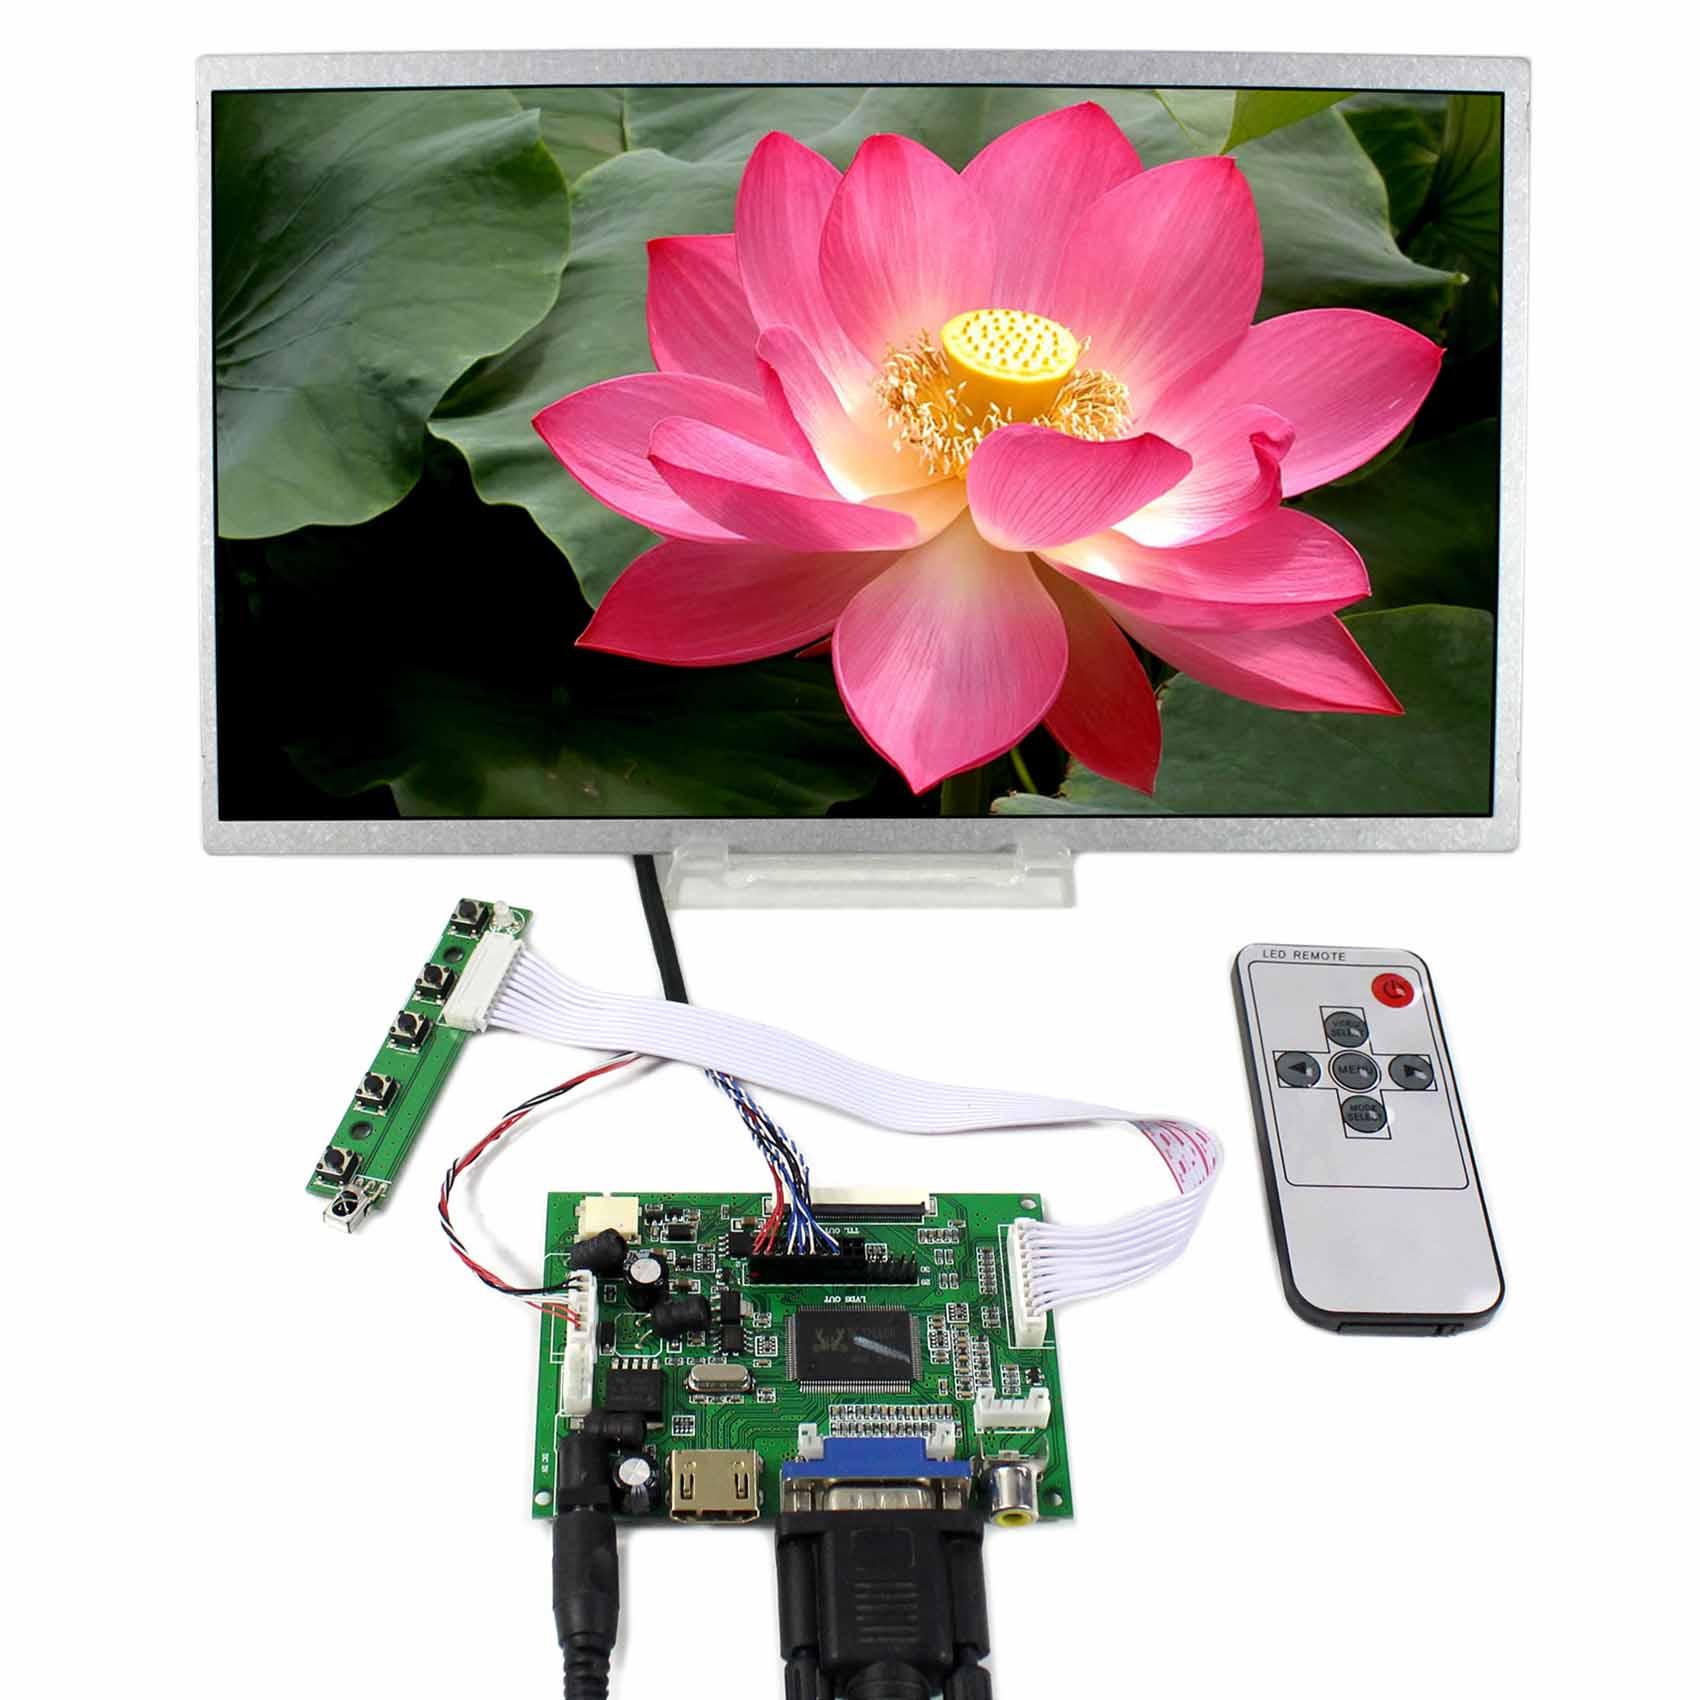 HDMI VGA 2AV LCD Controller Board+11.6inch 1366x768 N116B6 LP116WH1 B116XW02 LCD Screen vga hdmi lcd controller board for lp156whu tpb1 lp156whu tpa1 lp156whu tpbh lp156whu tpd1 15 6 inch edp 30 pins 1 lane 1366x768